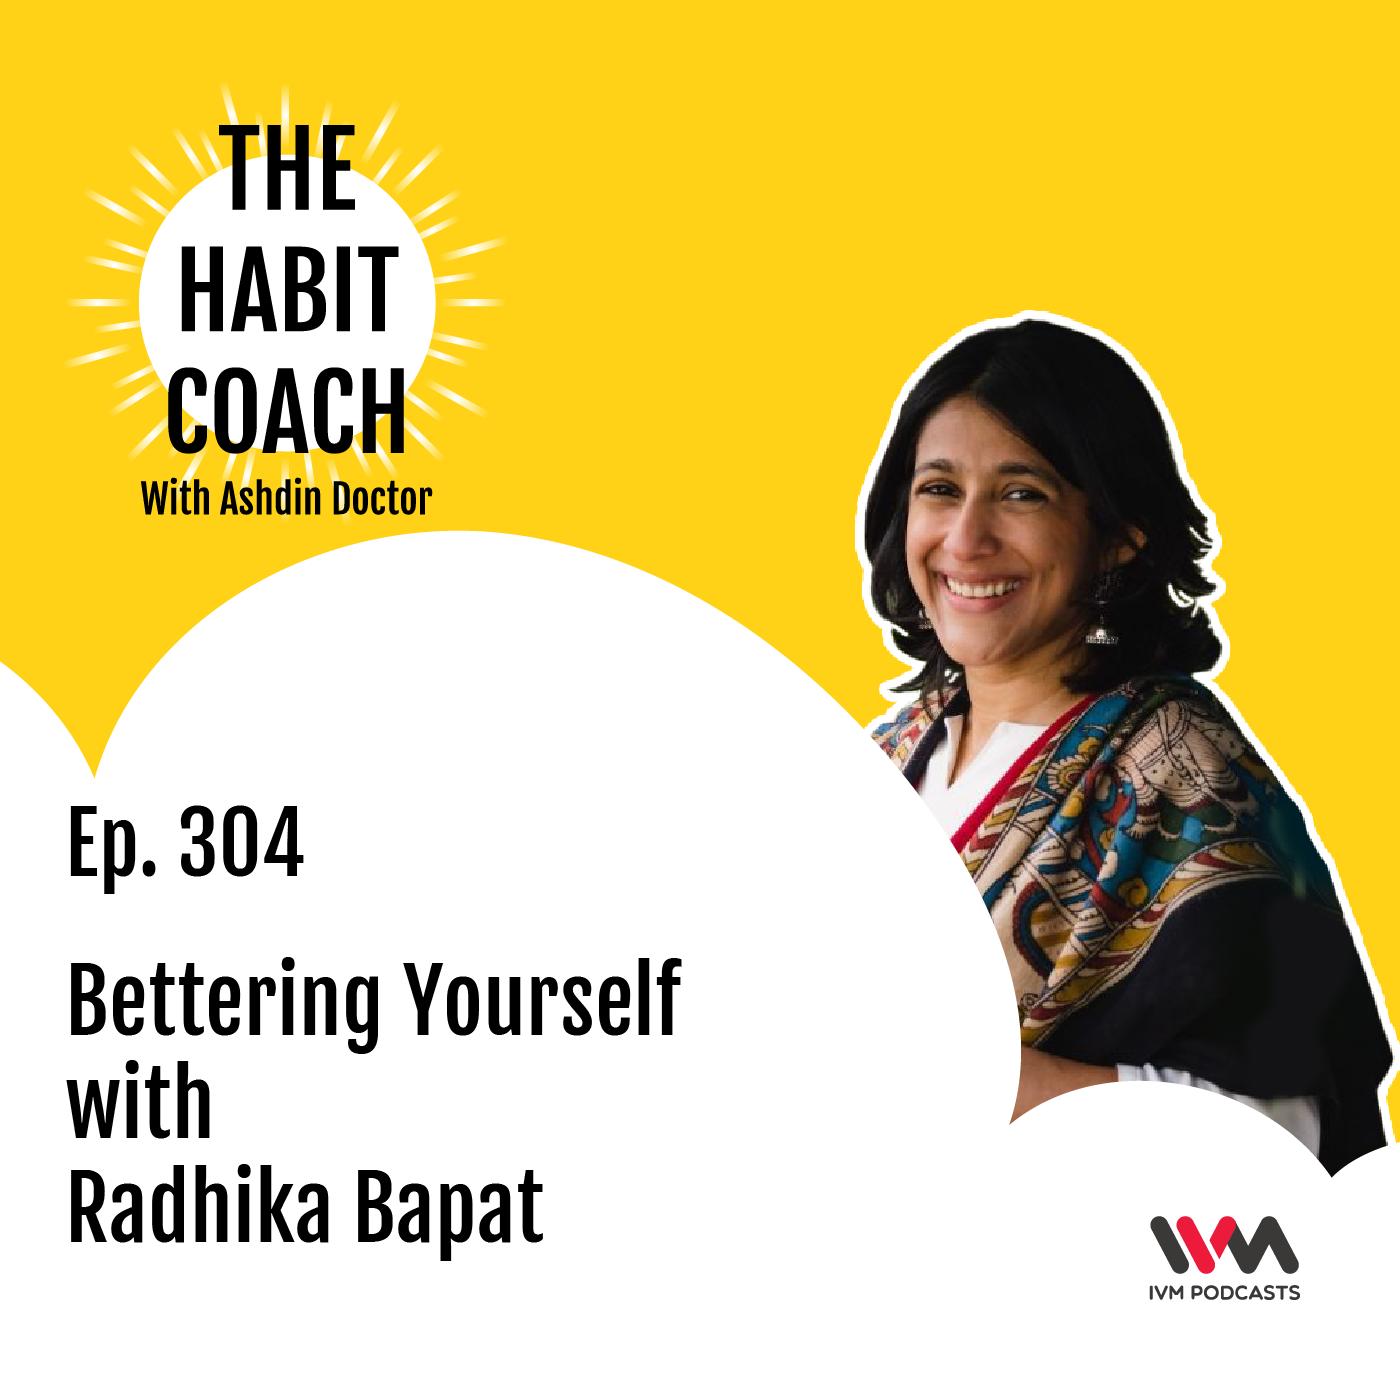 Ep. 304: Bettering Yourself with Radhika Bapat